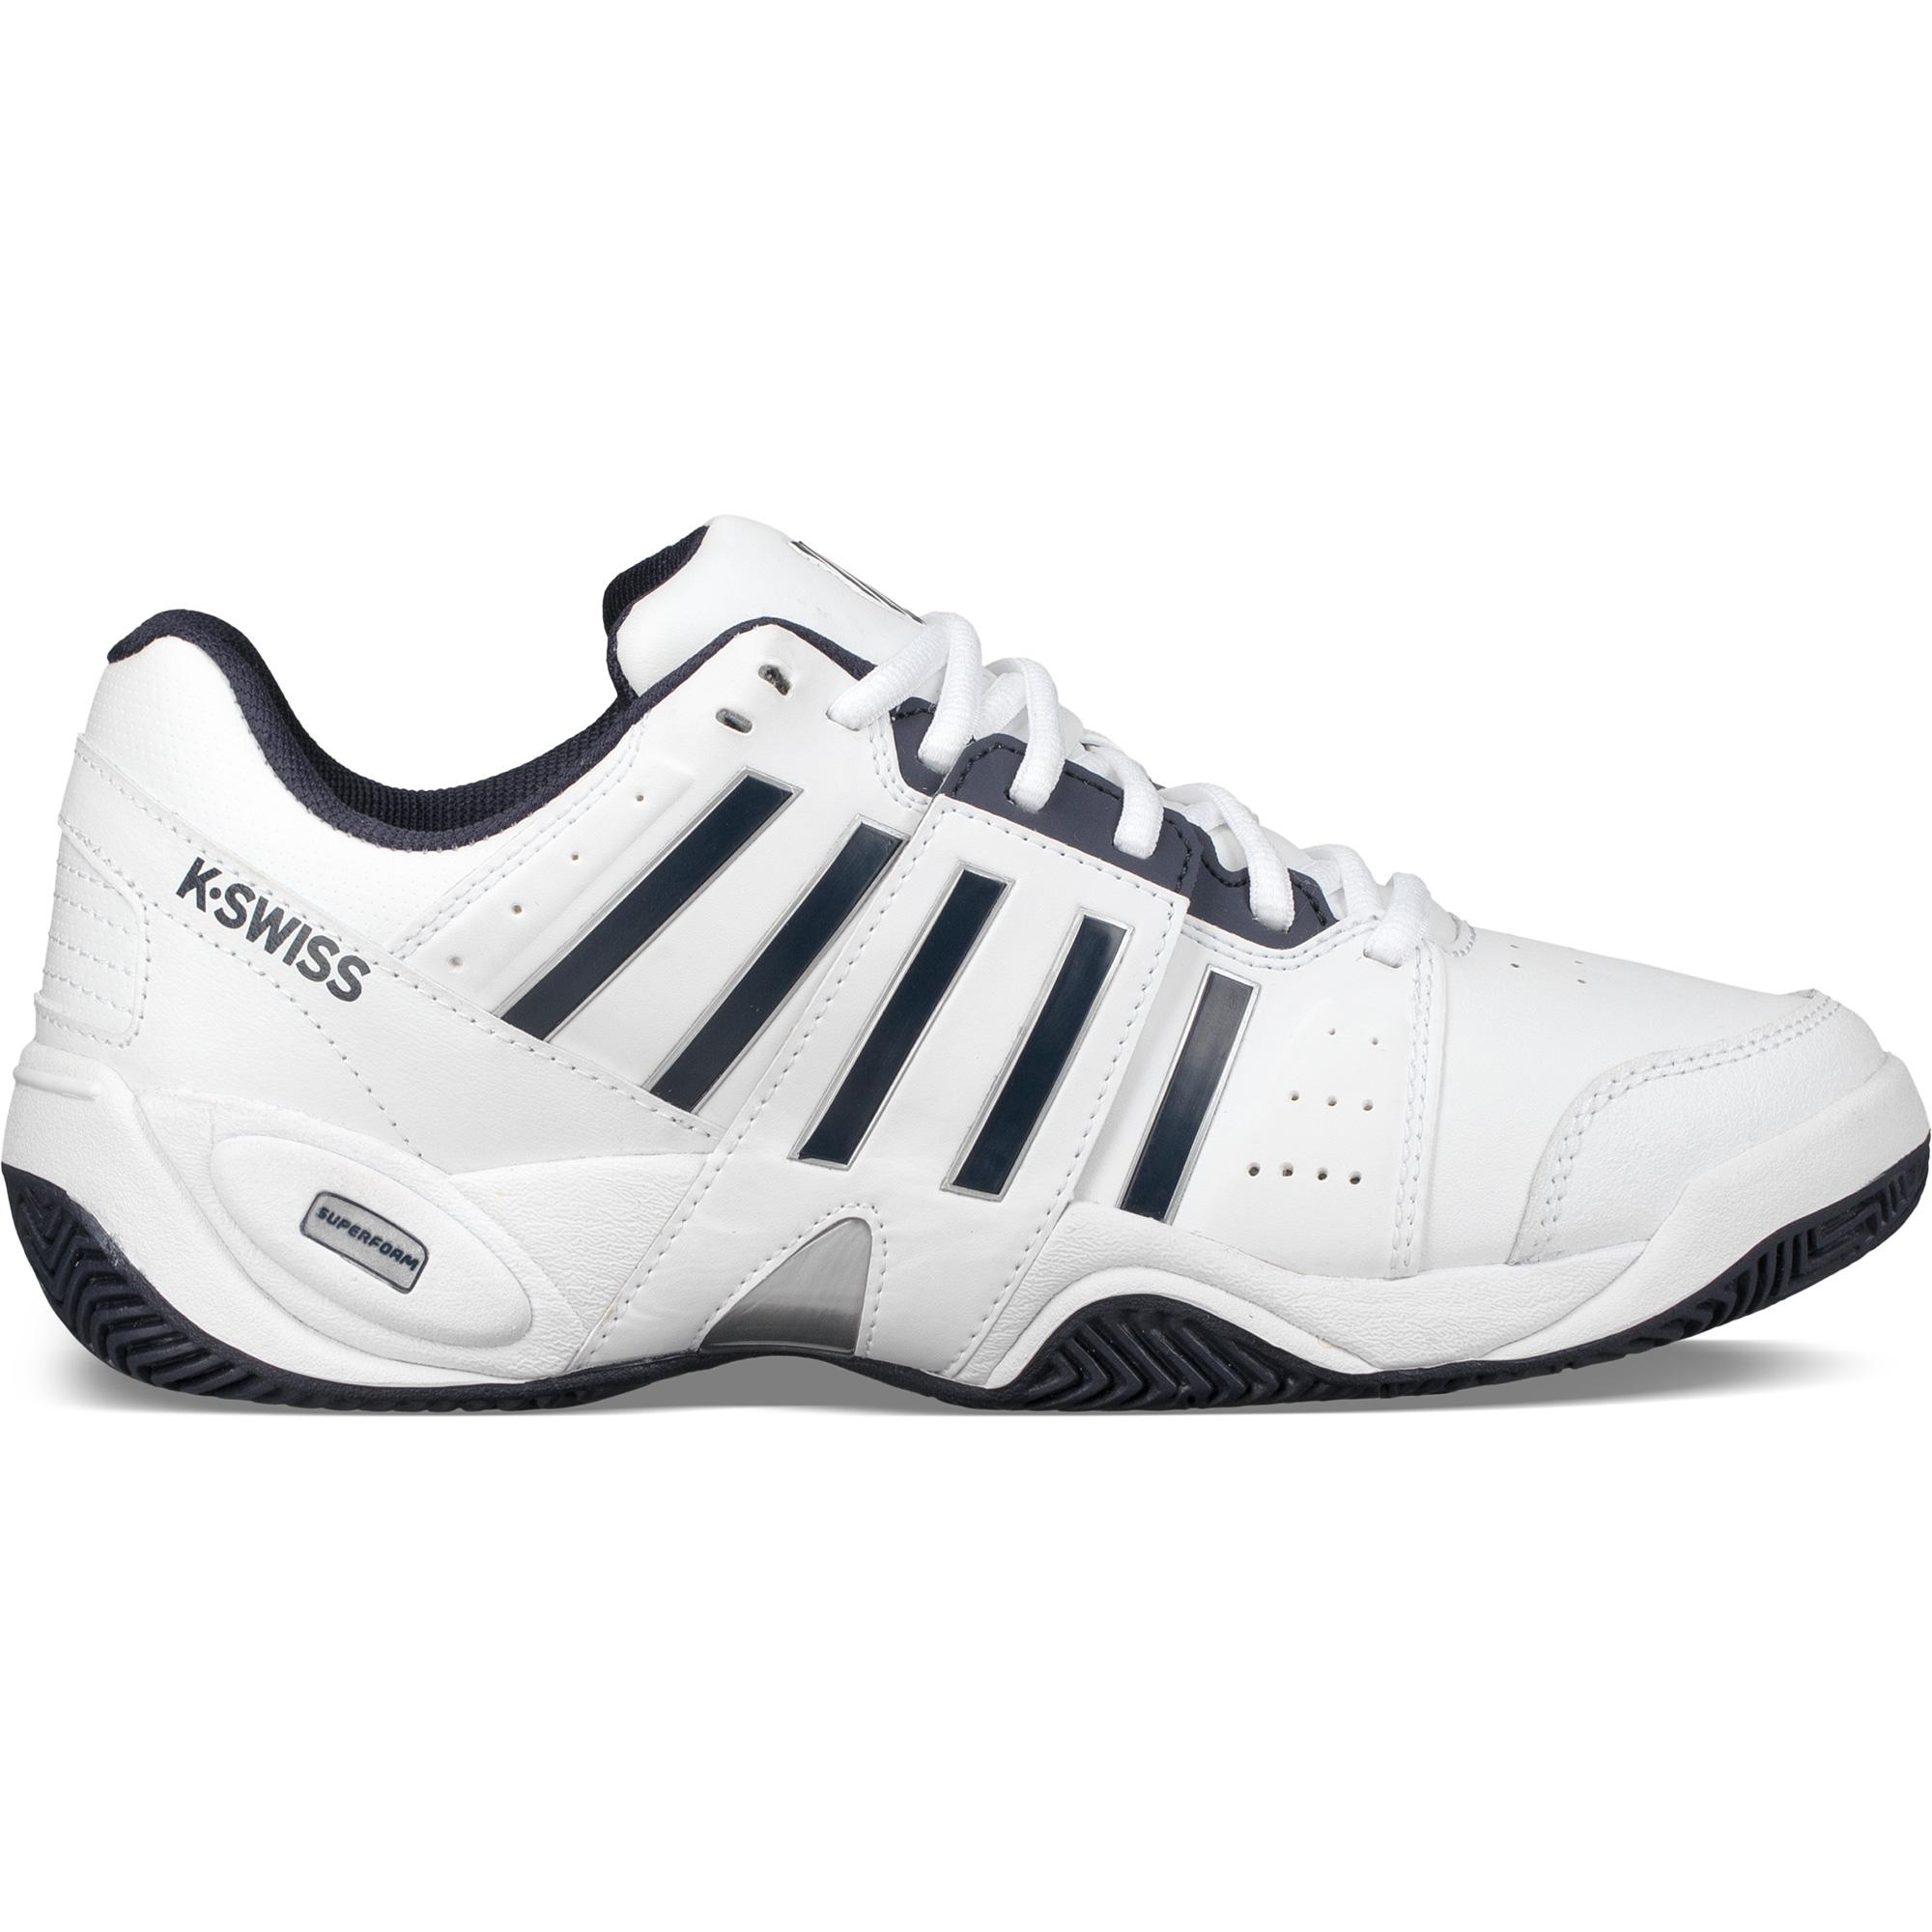 K-Swiss Mens Accomplish III Tennis Shoes - White Navy - Tennisnuts.com 491ac564646e